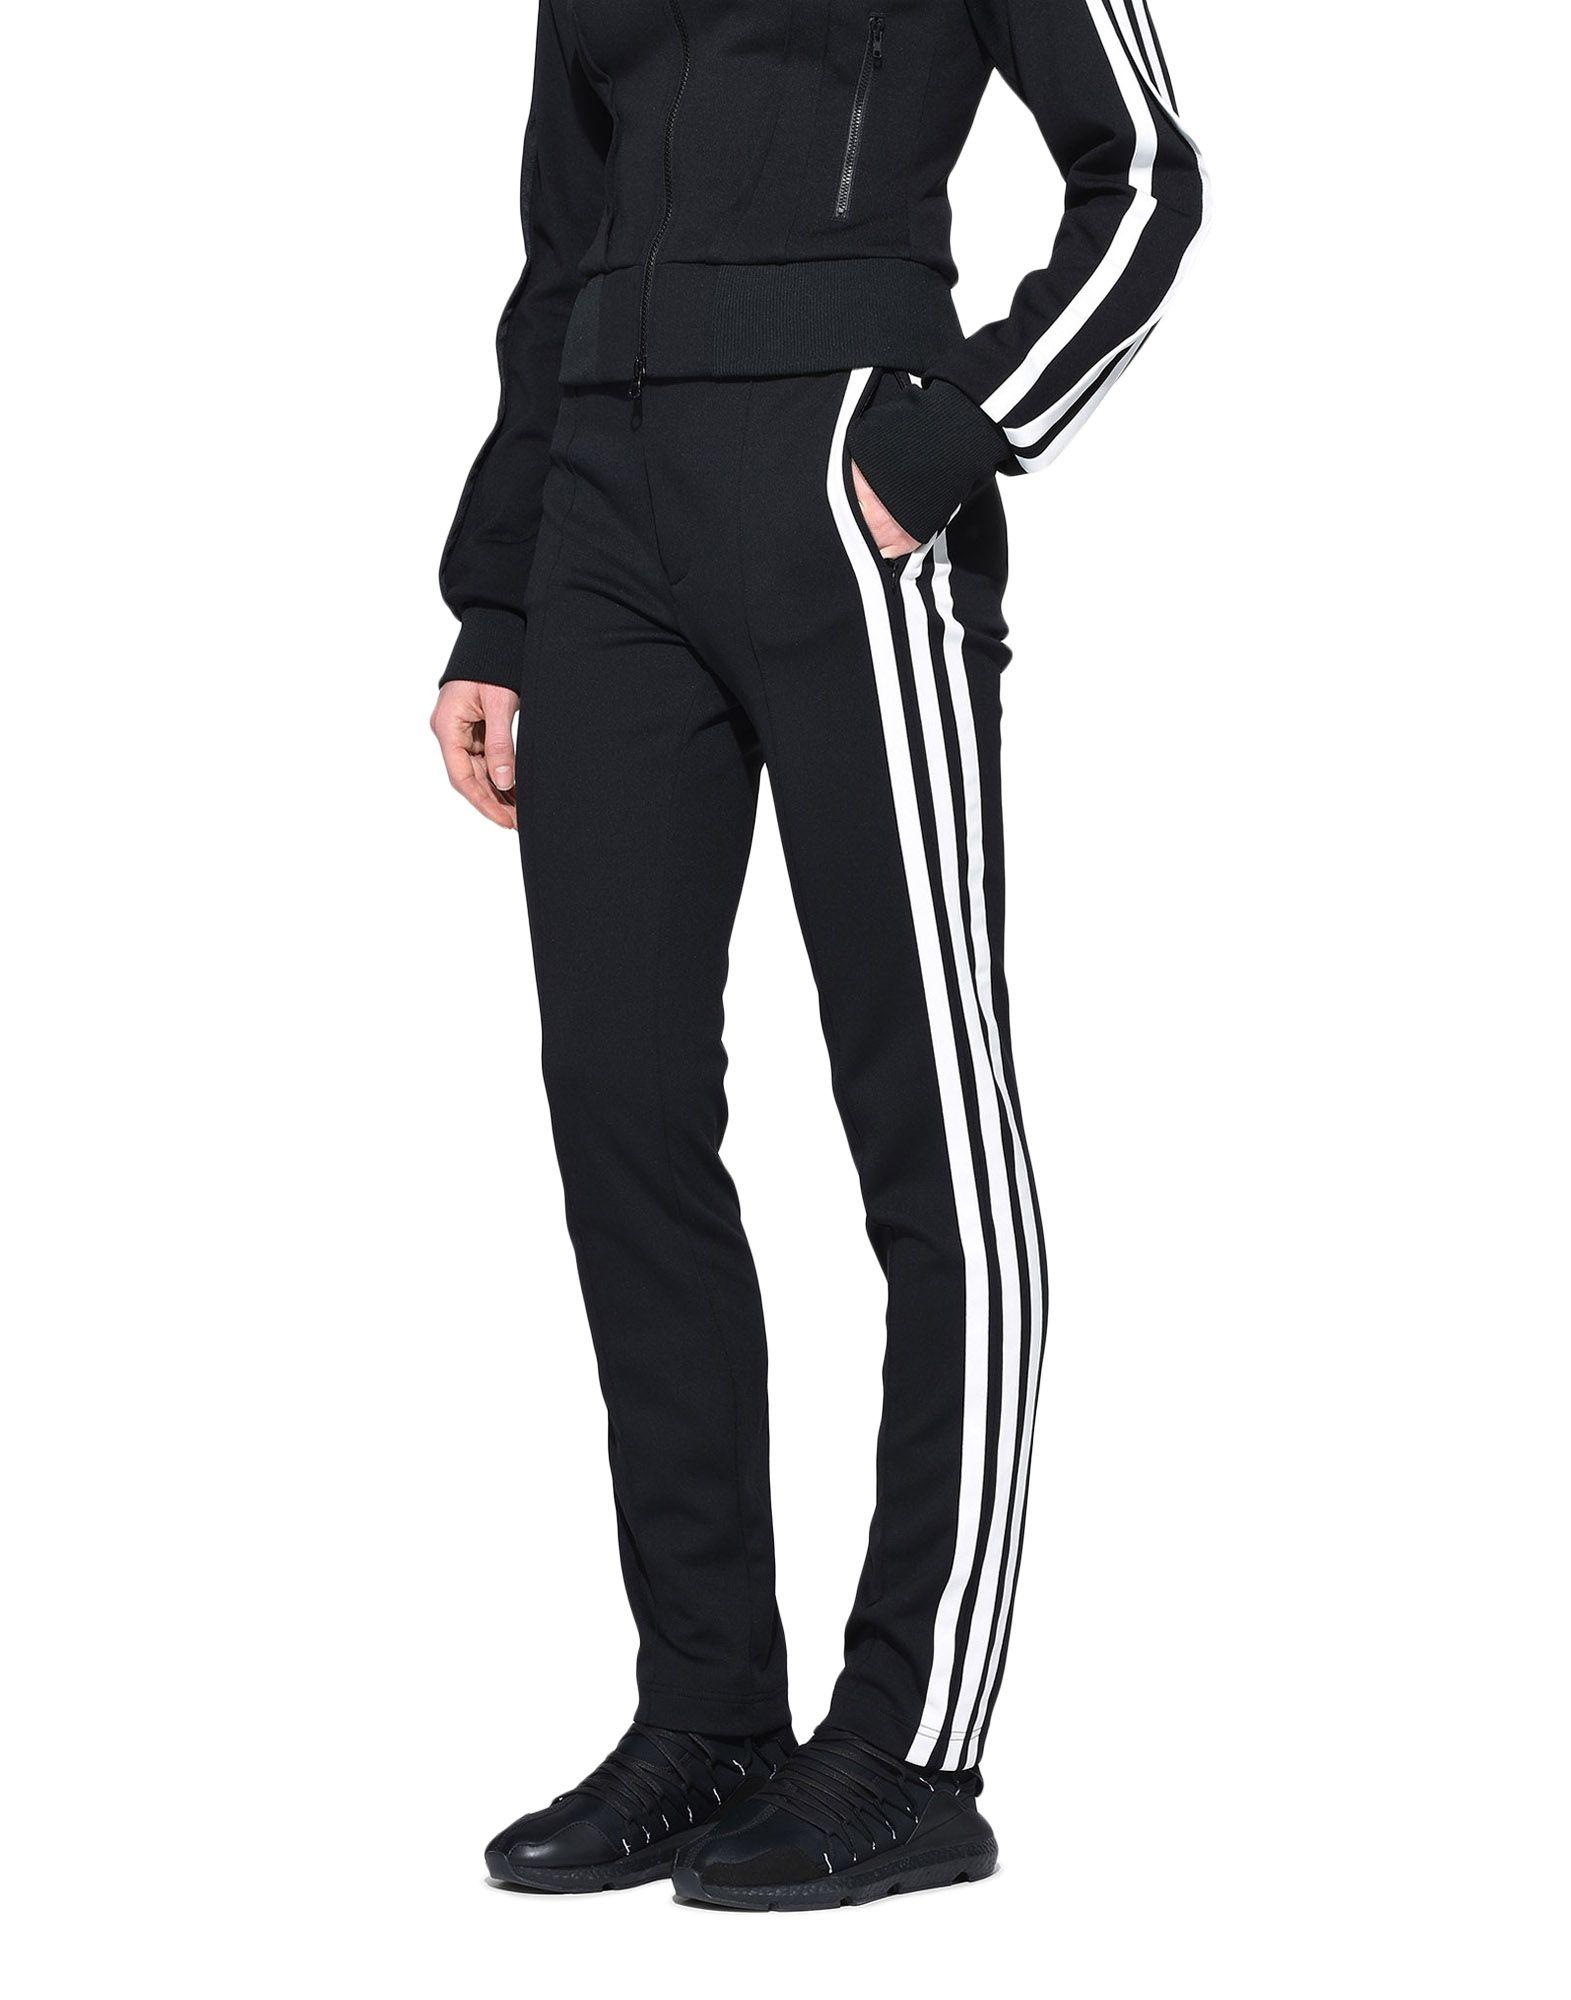 Y-3 Y-3 High Waist Matte Track Pants Casual pants Woman e